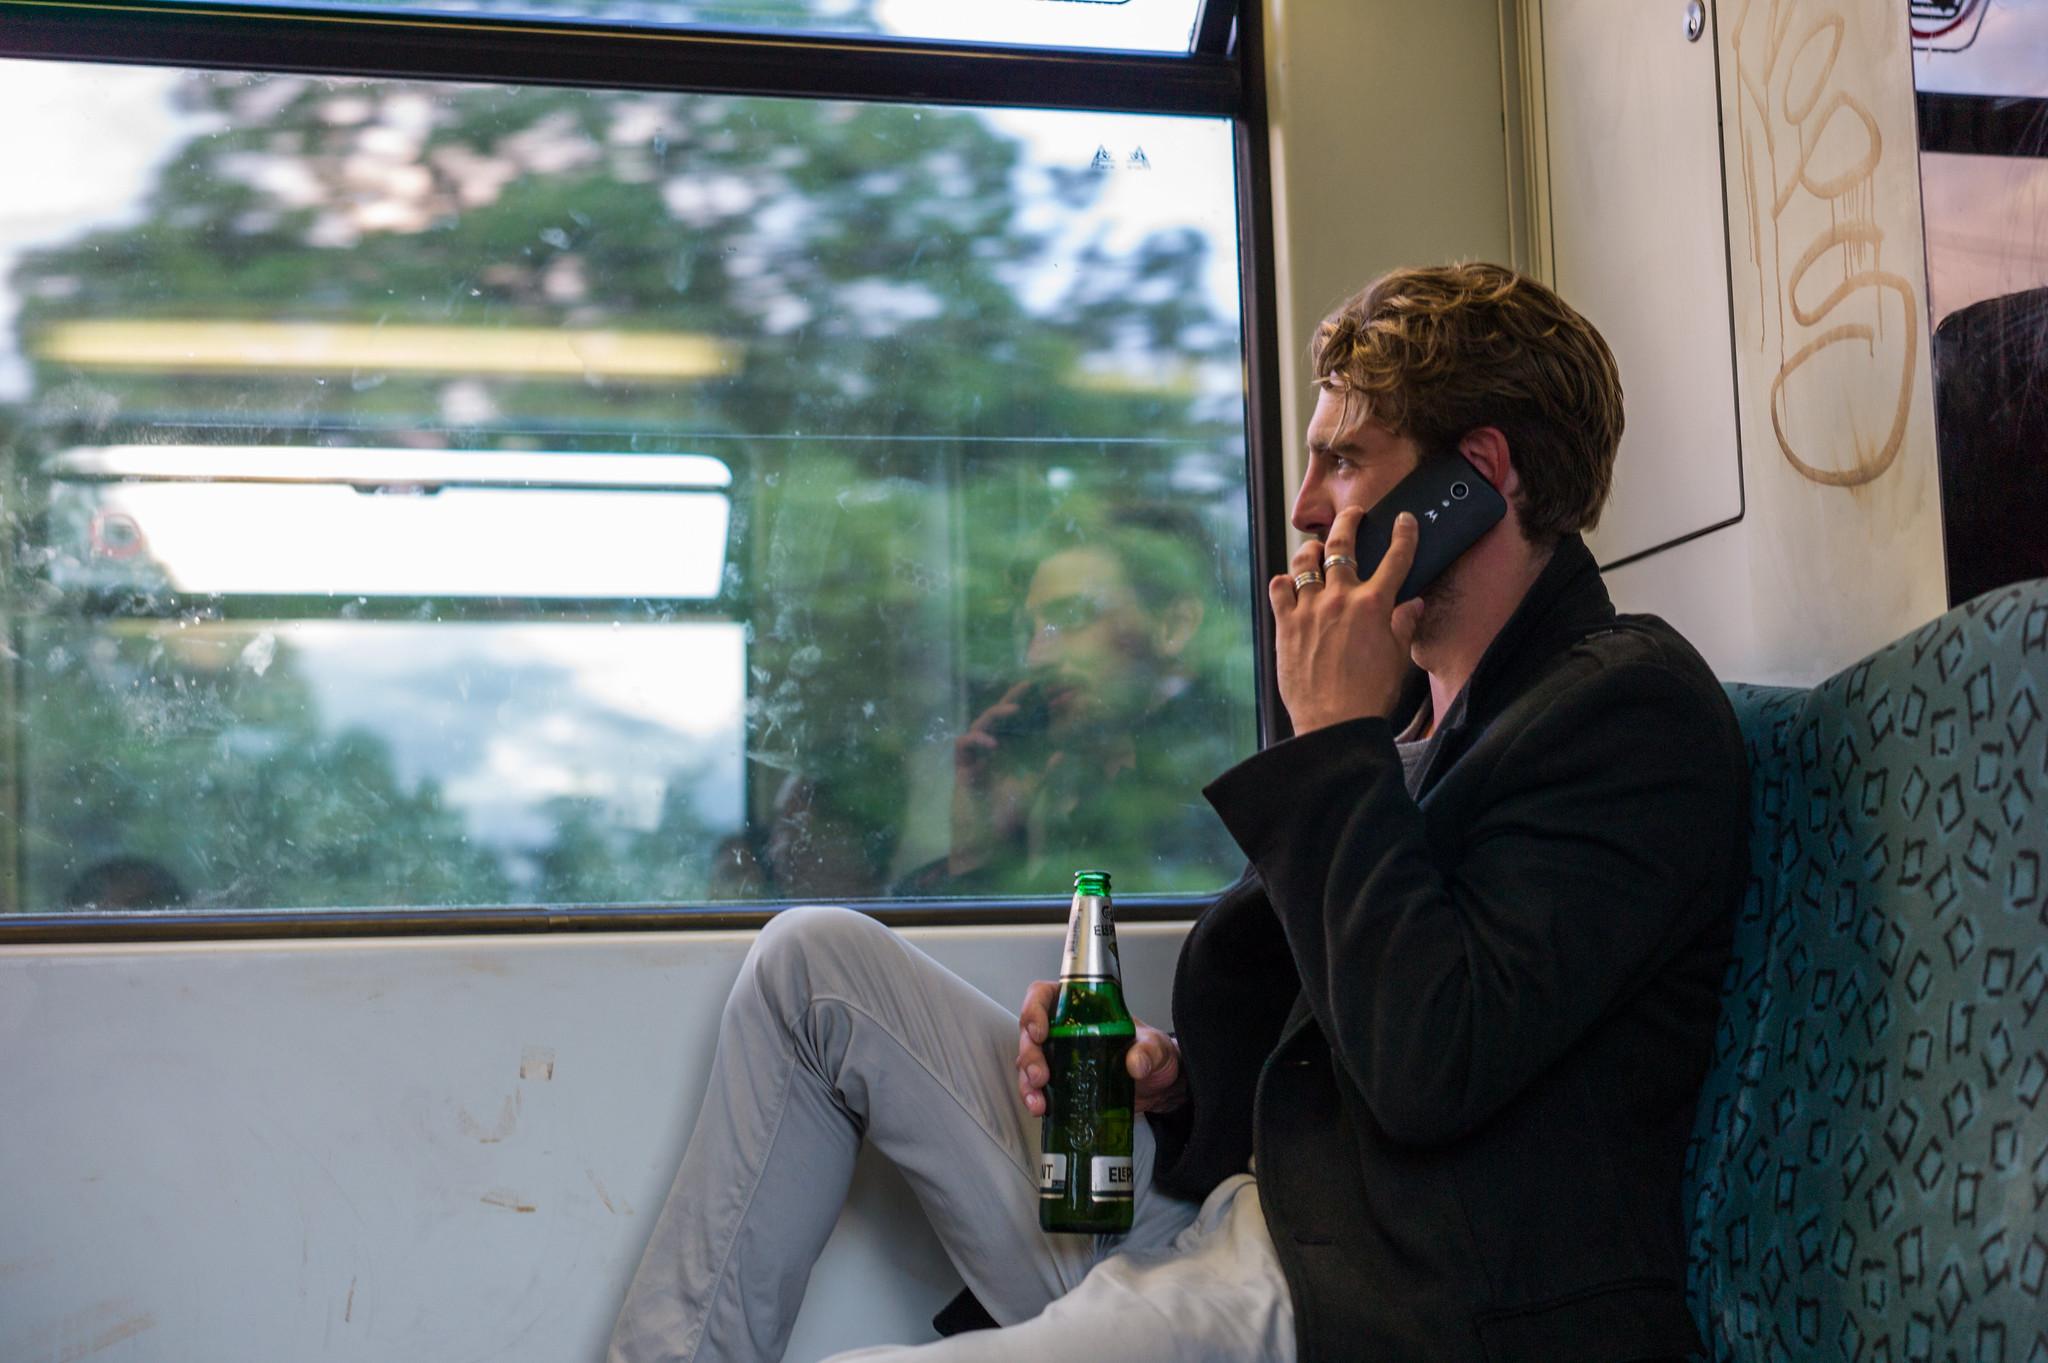 People in Berlin are always DRUNK!